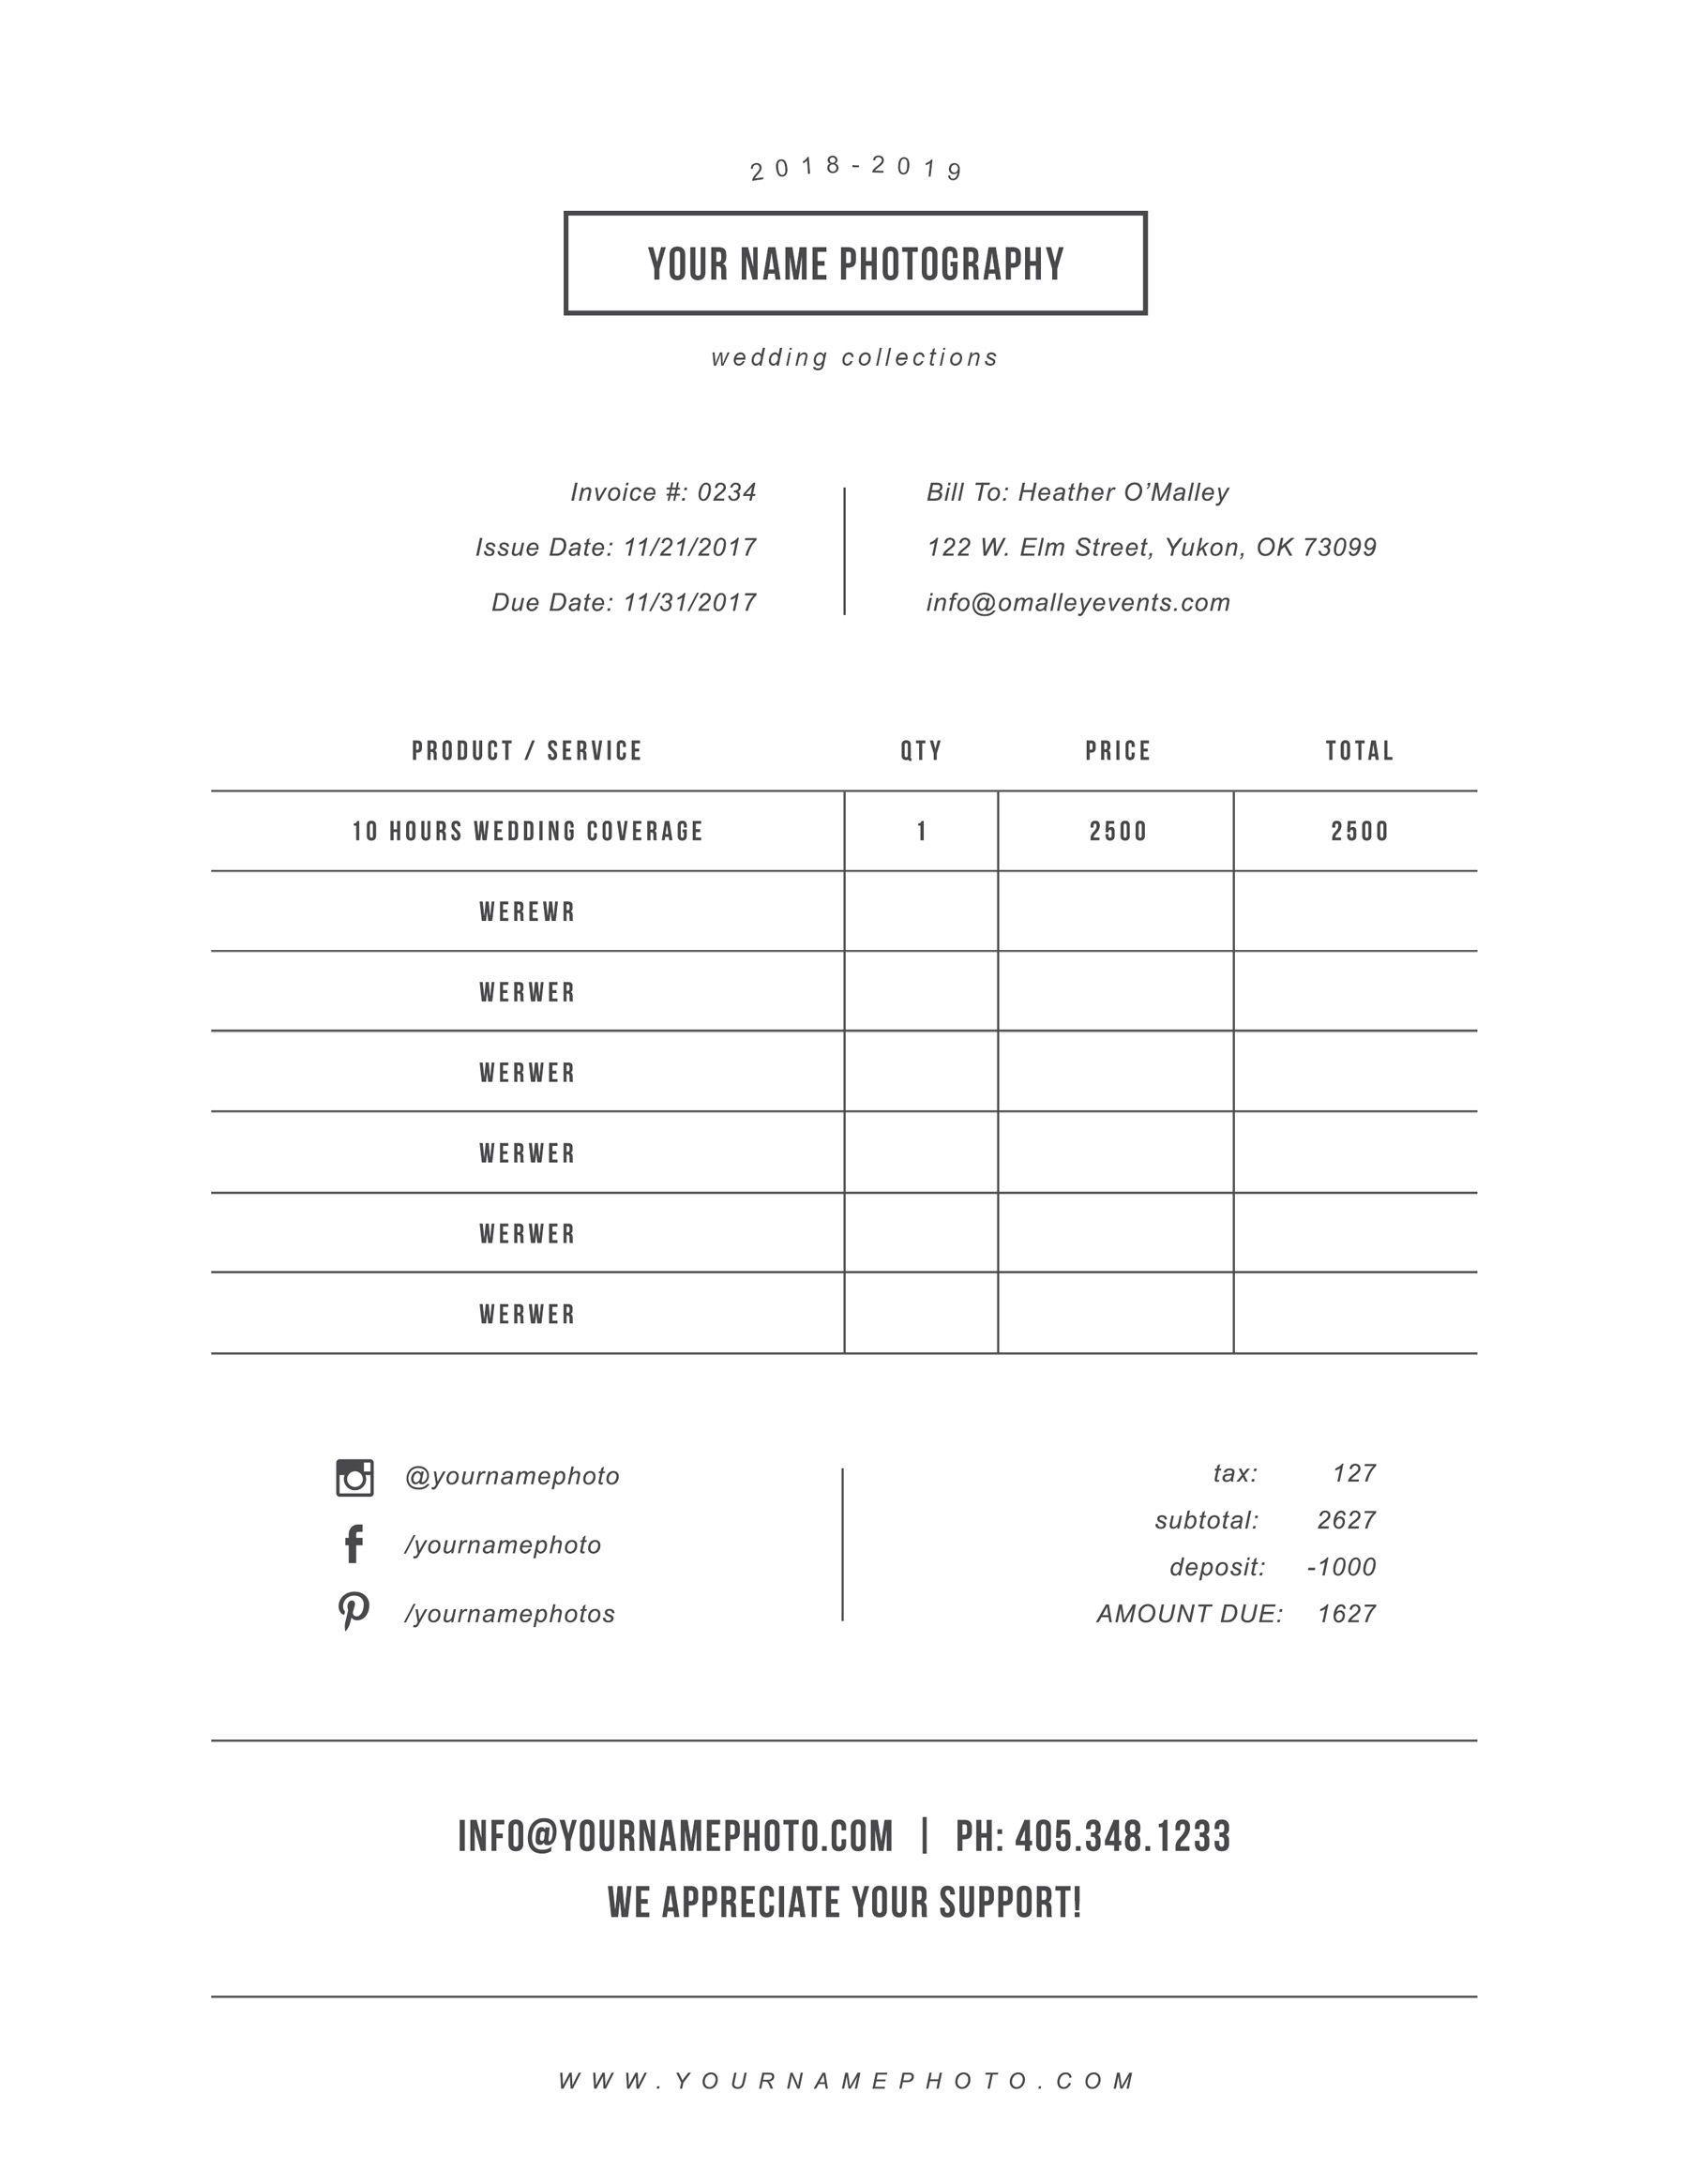 Photographer Invoice Design Template Minimal Photography Invoice Template Photography Invoice Invoice Design